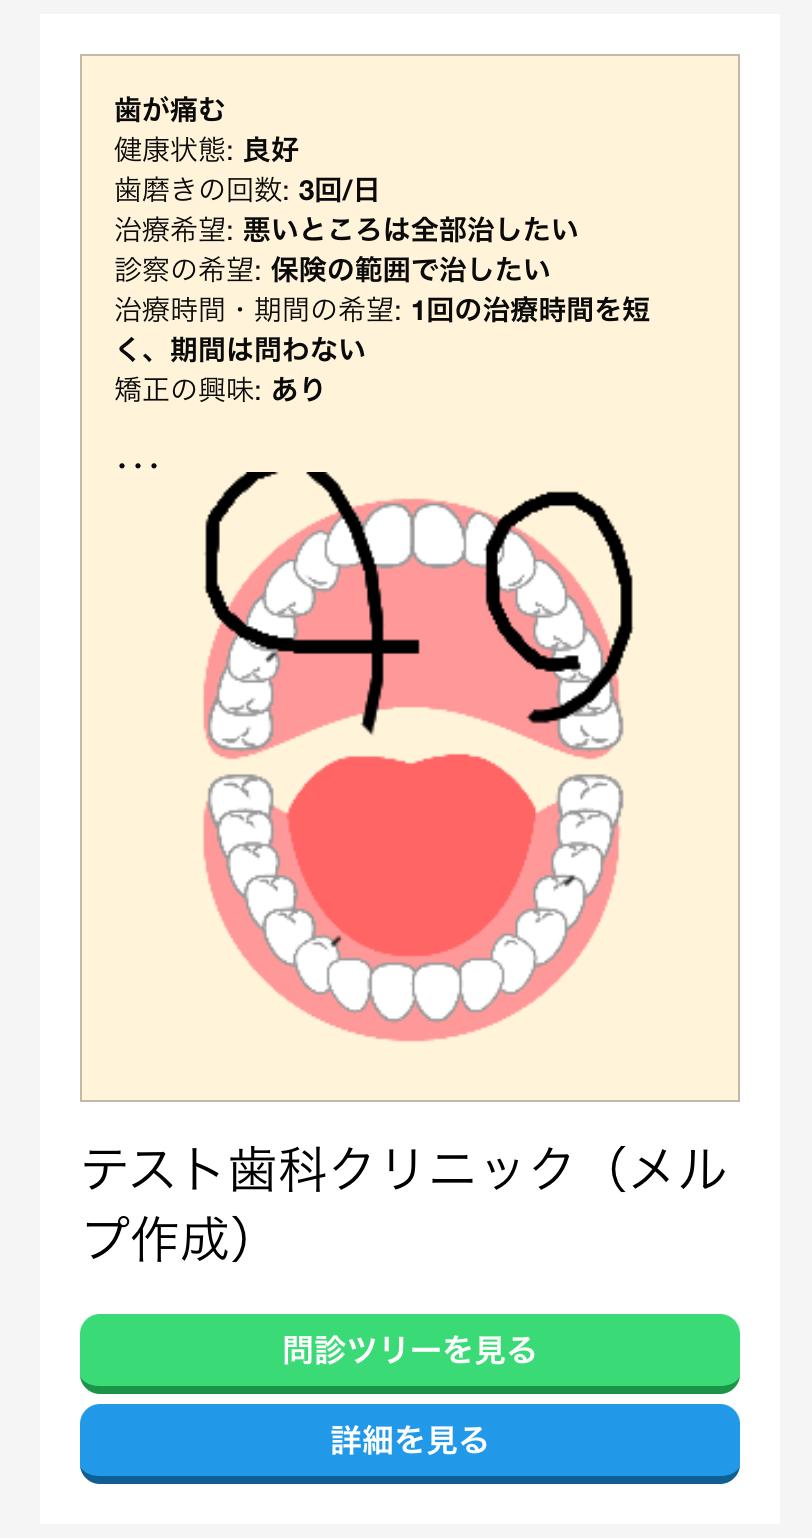 dental-monshin-thumbnail